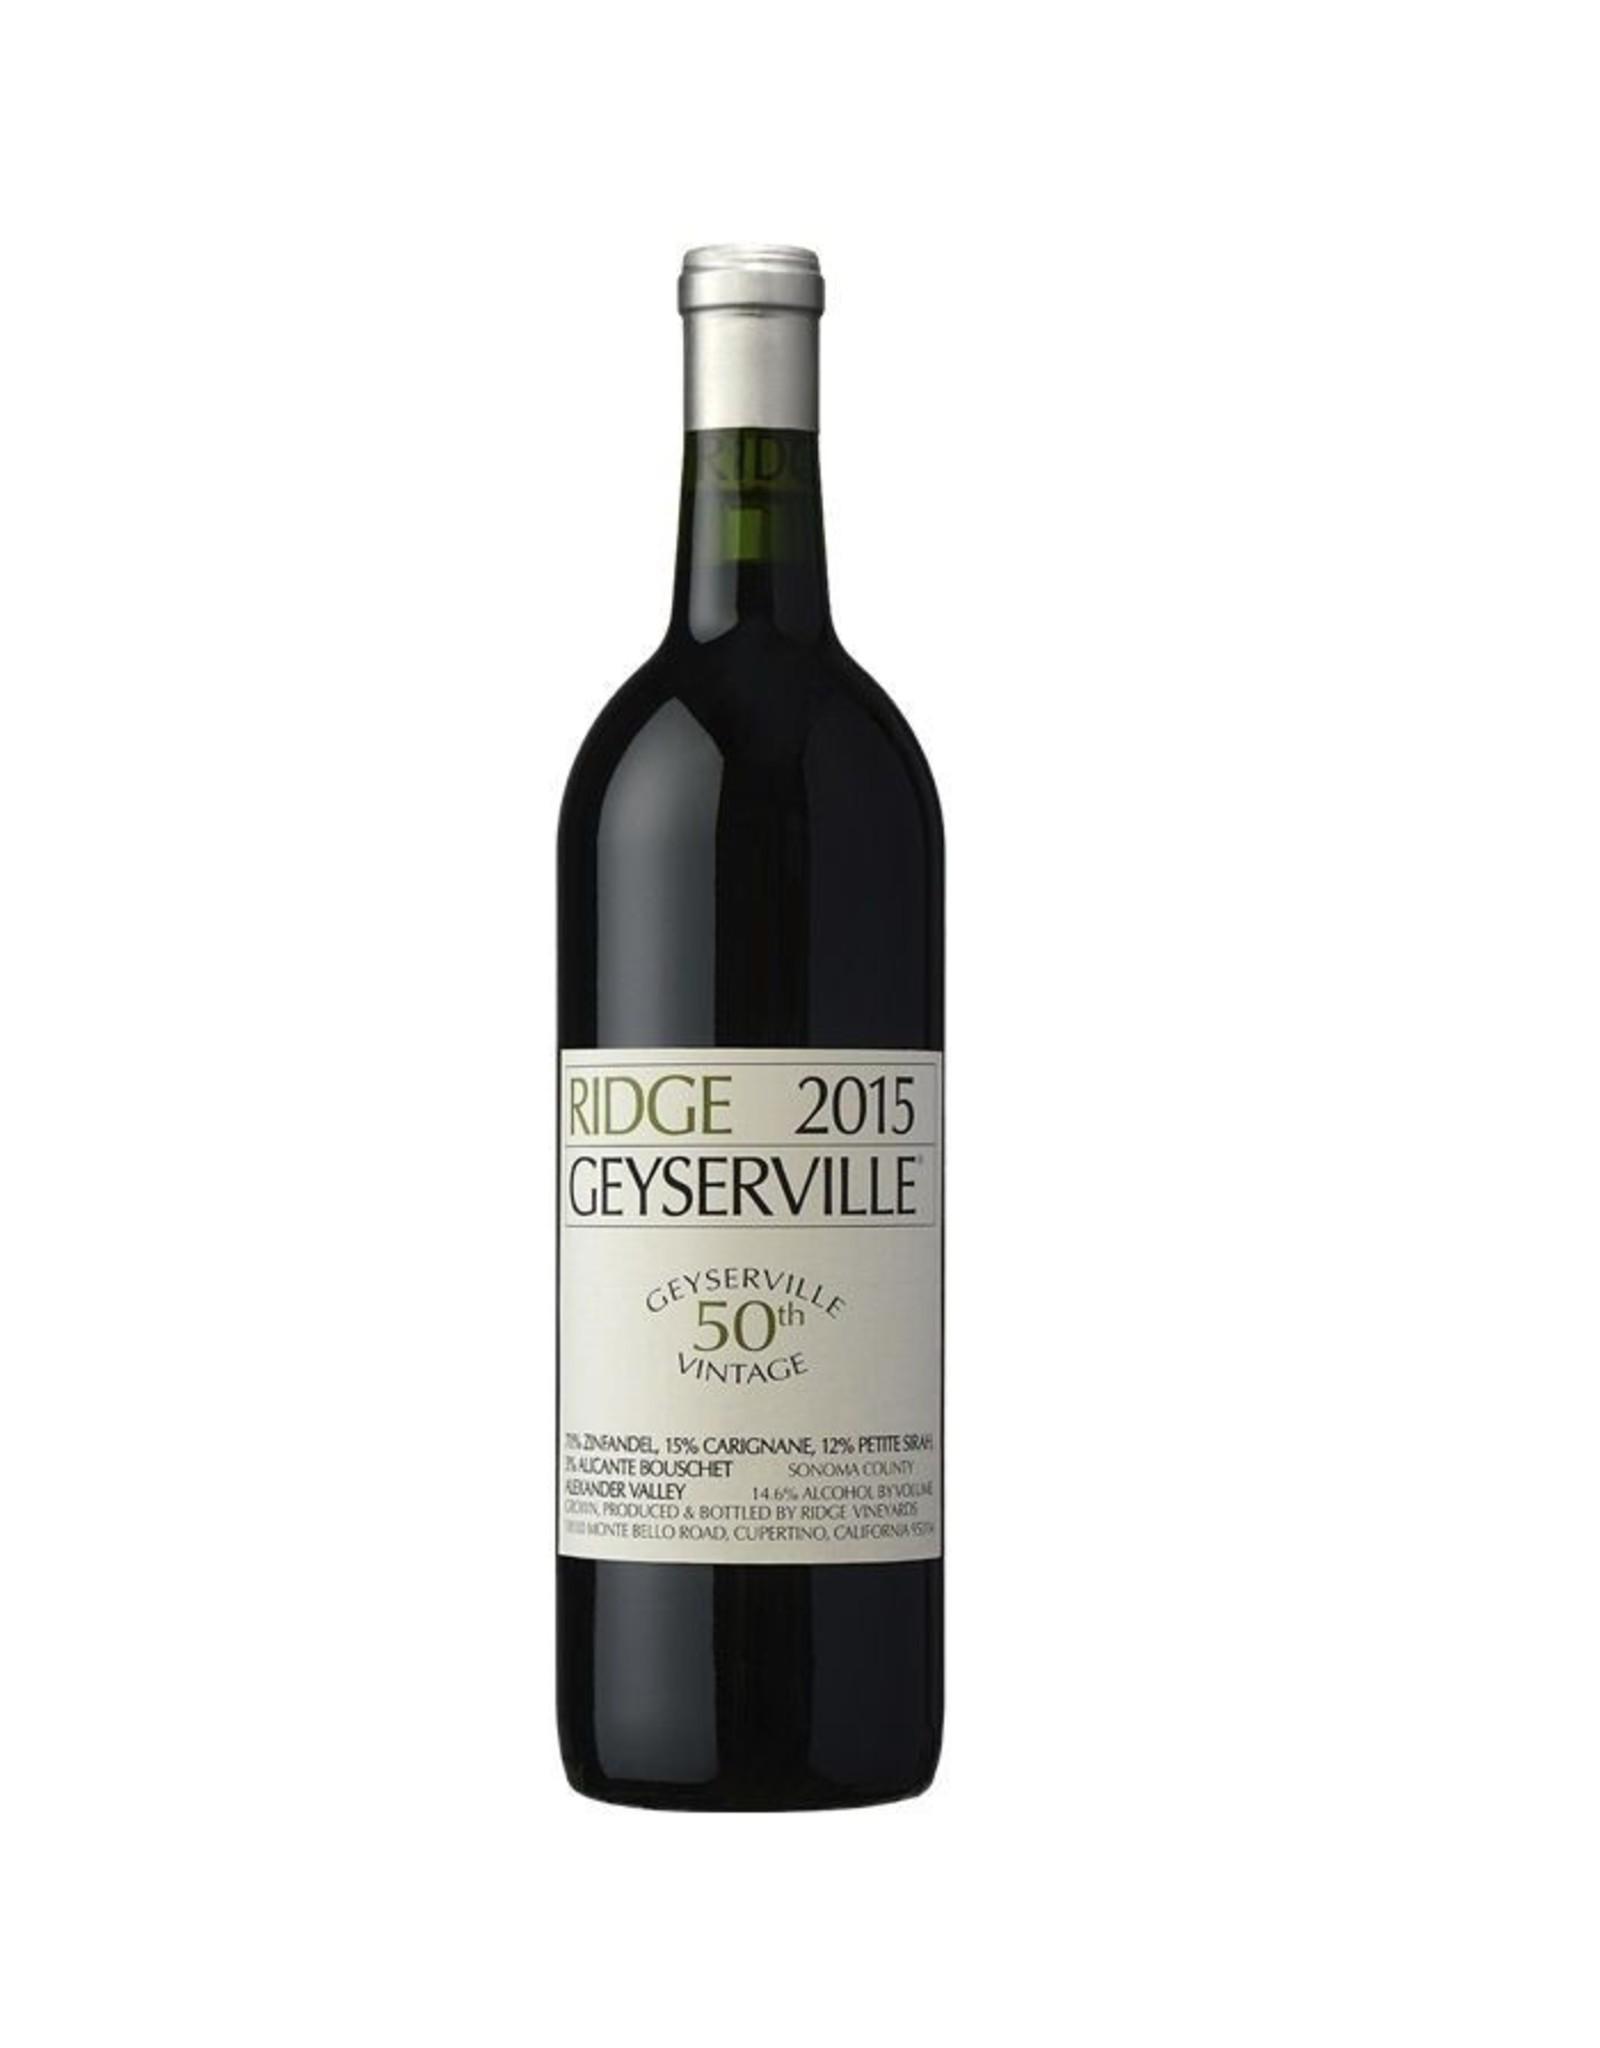 Red Wine 2015, 750ml Ridge Geyserville, Red Blend, Alexander Valley, Sonoma County, California, 14.5% Alc, TW94